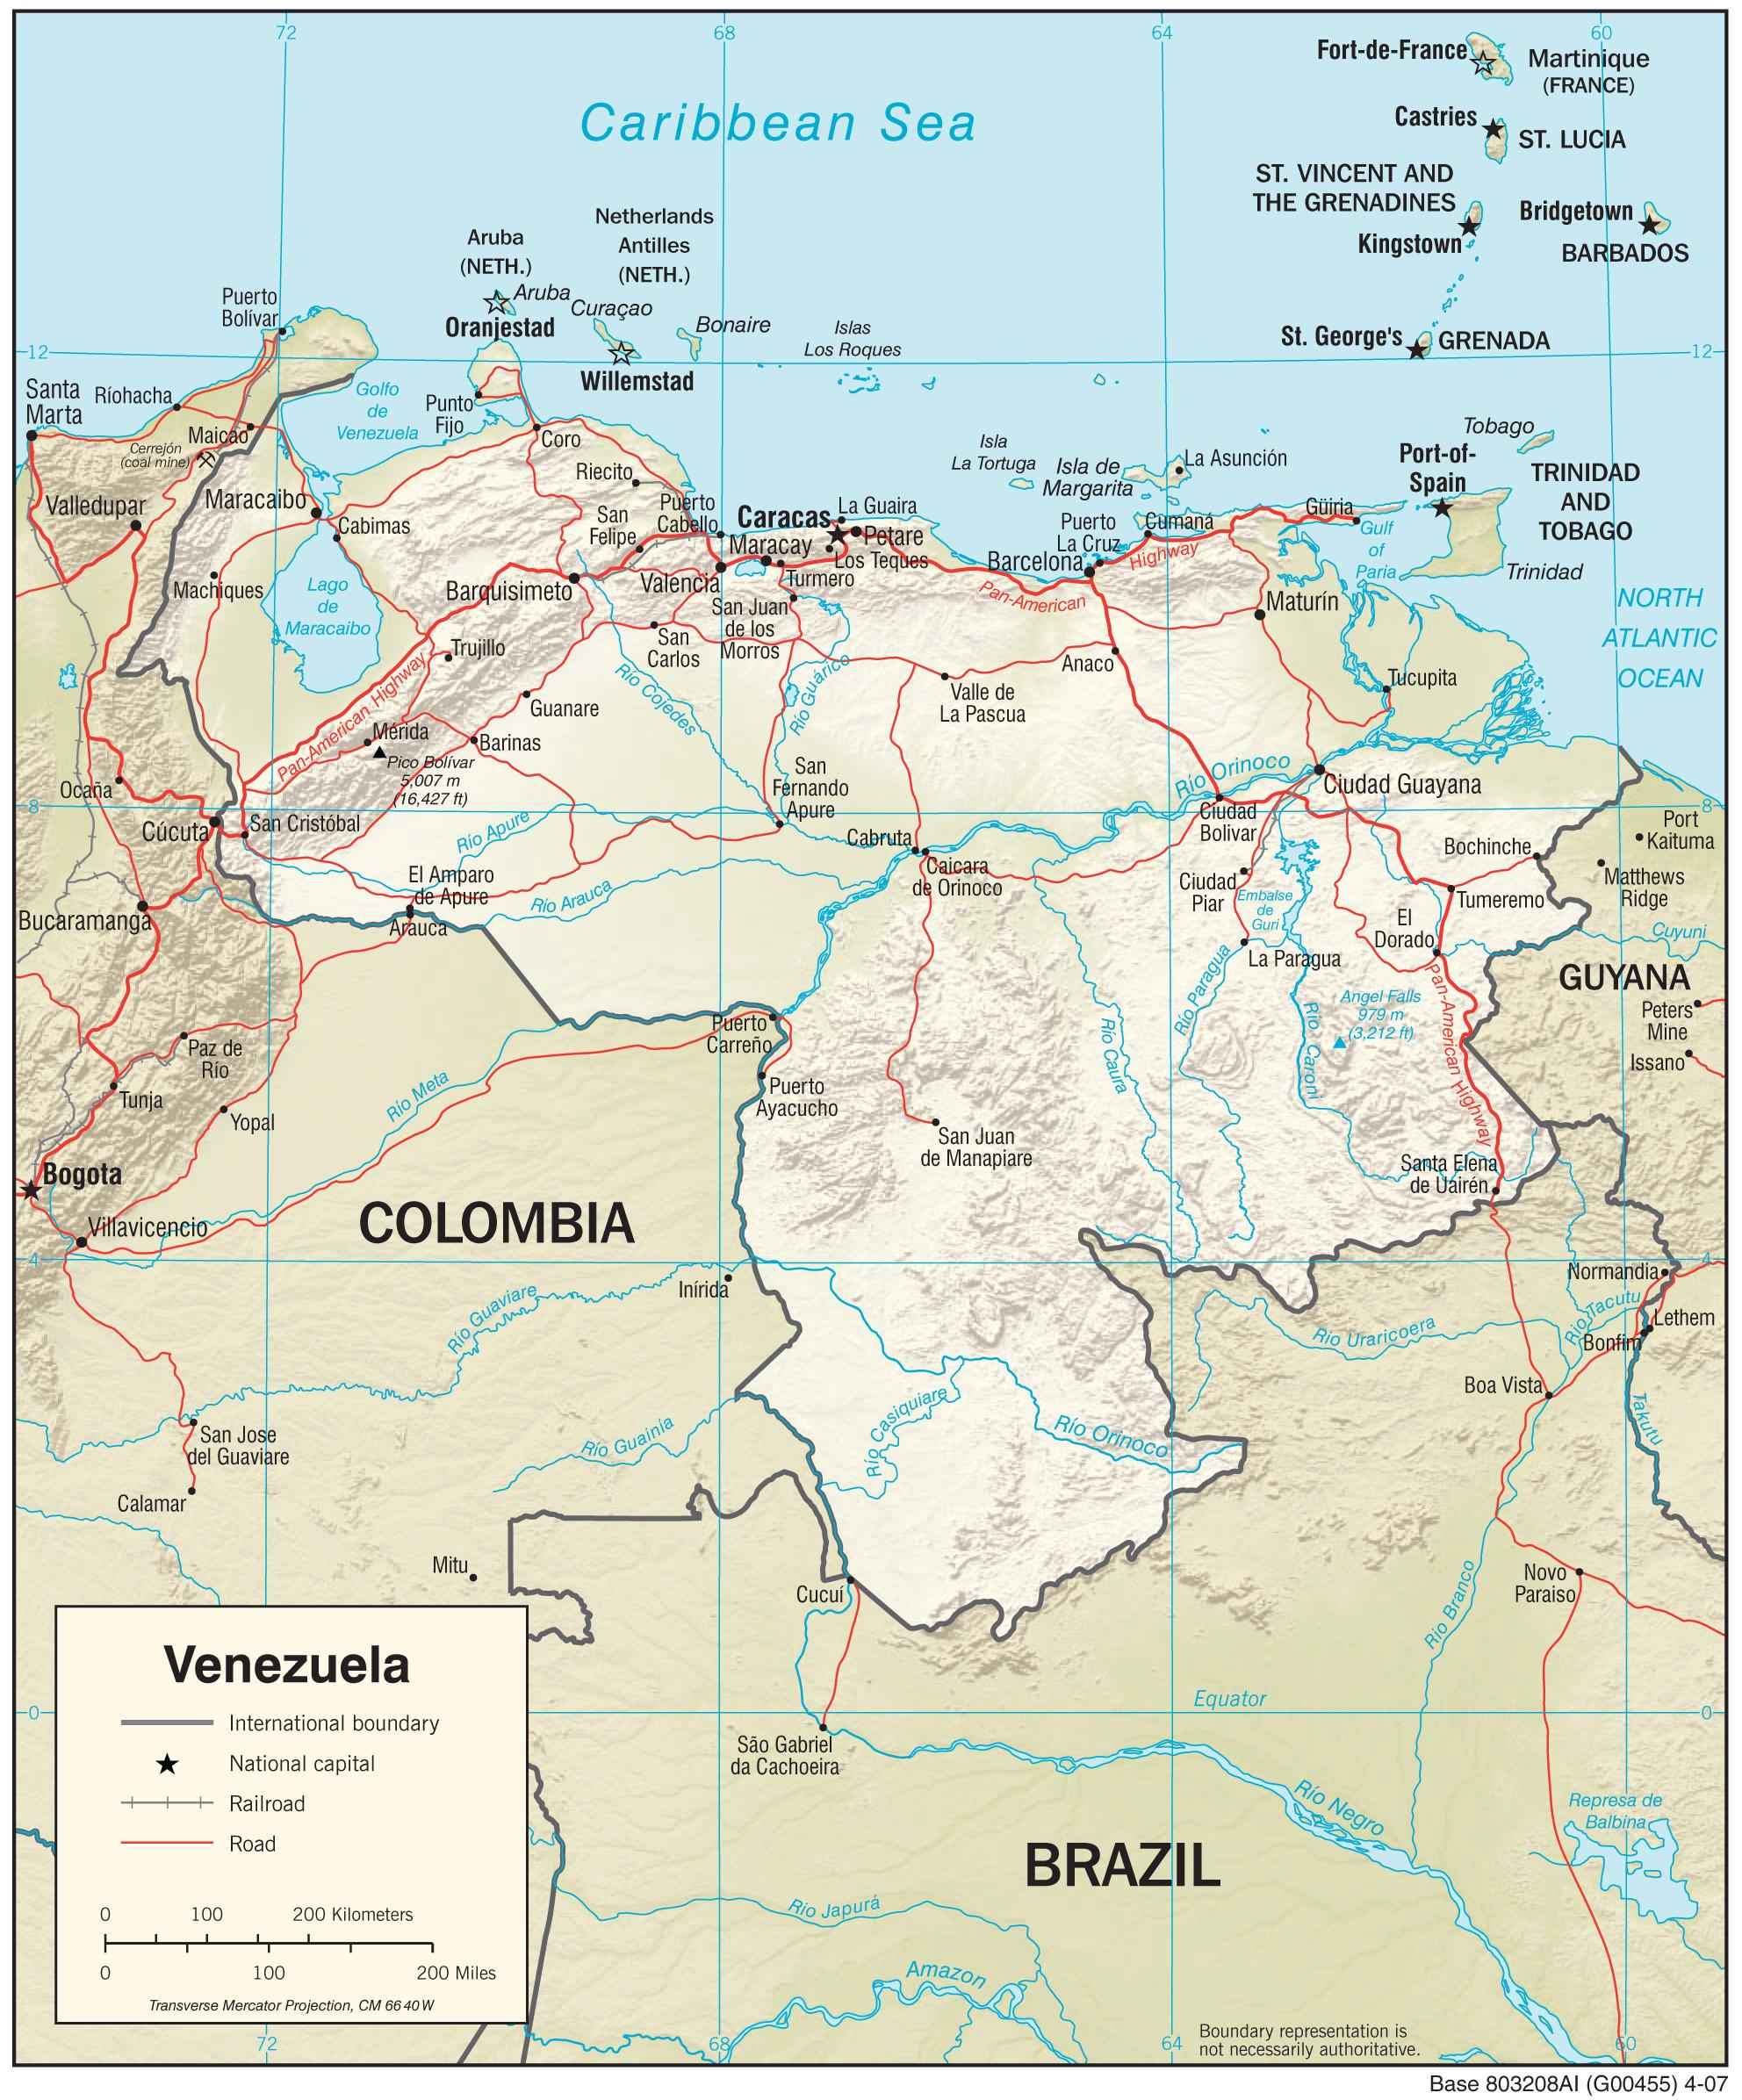 Venezuela Maps PerryCastañeda Map Collection UT Library Online - Venezuela map